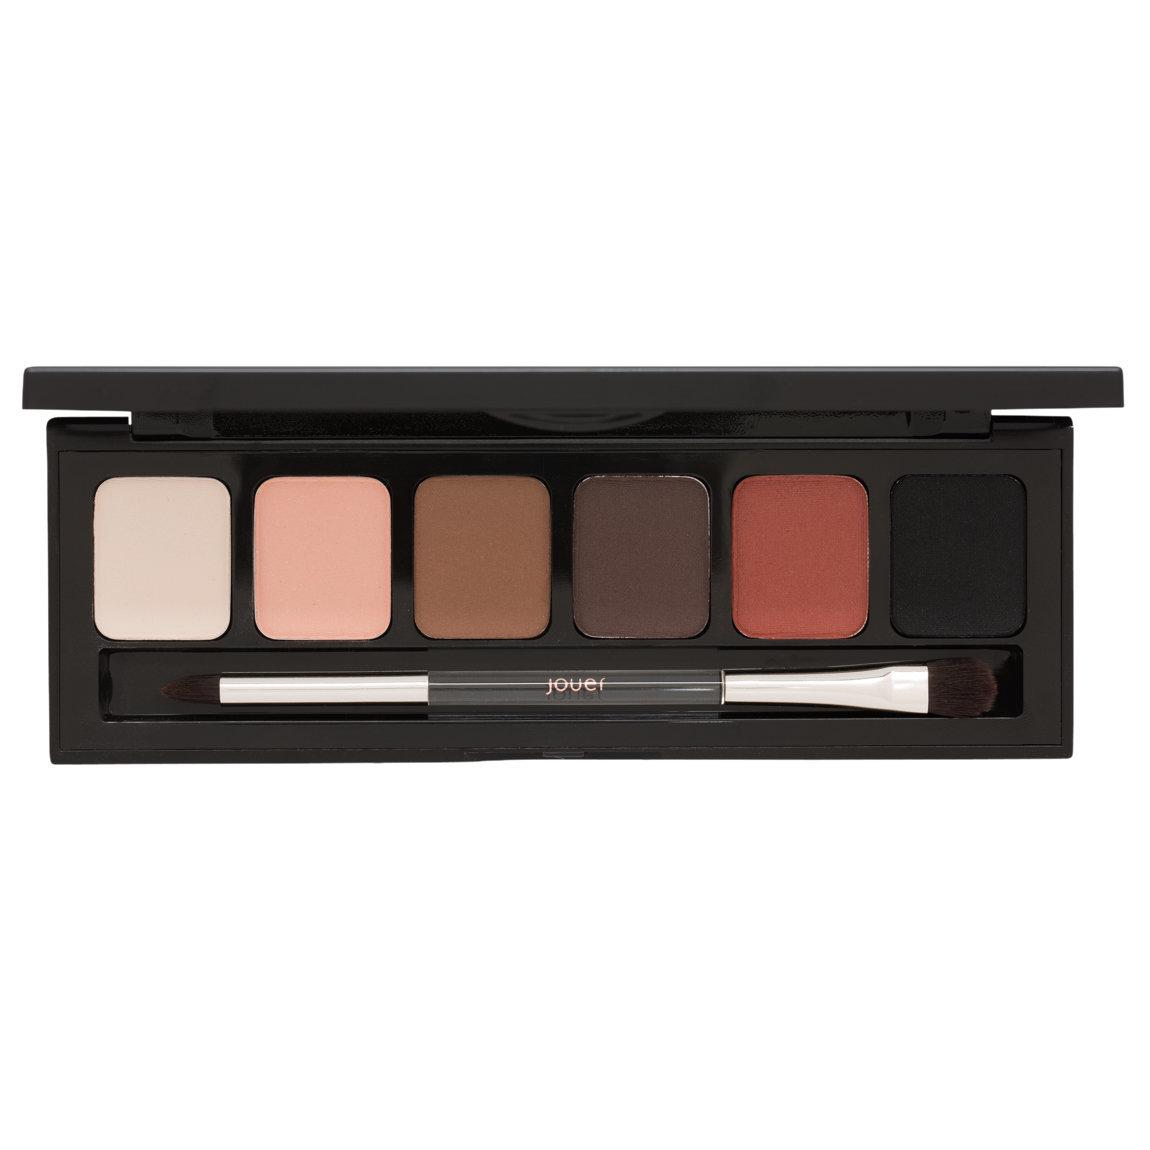 Jouer Cosmetics Essential Jet-Set Matte Eyeshadow Palette alternative view 1 - product swatch.